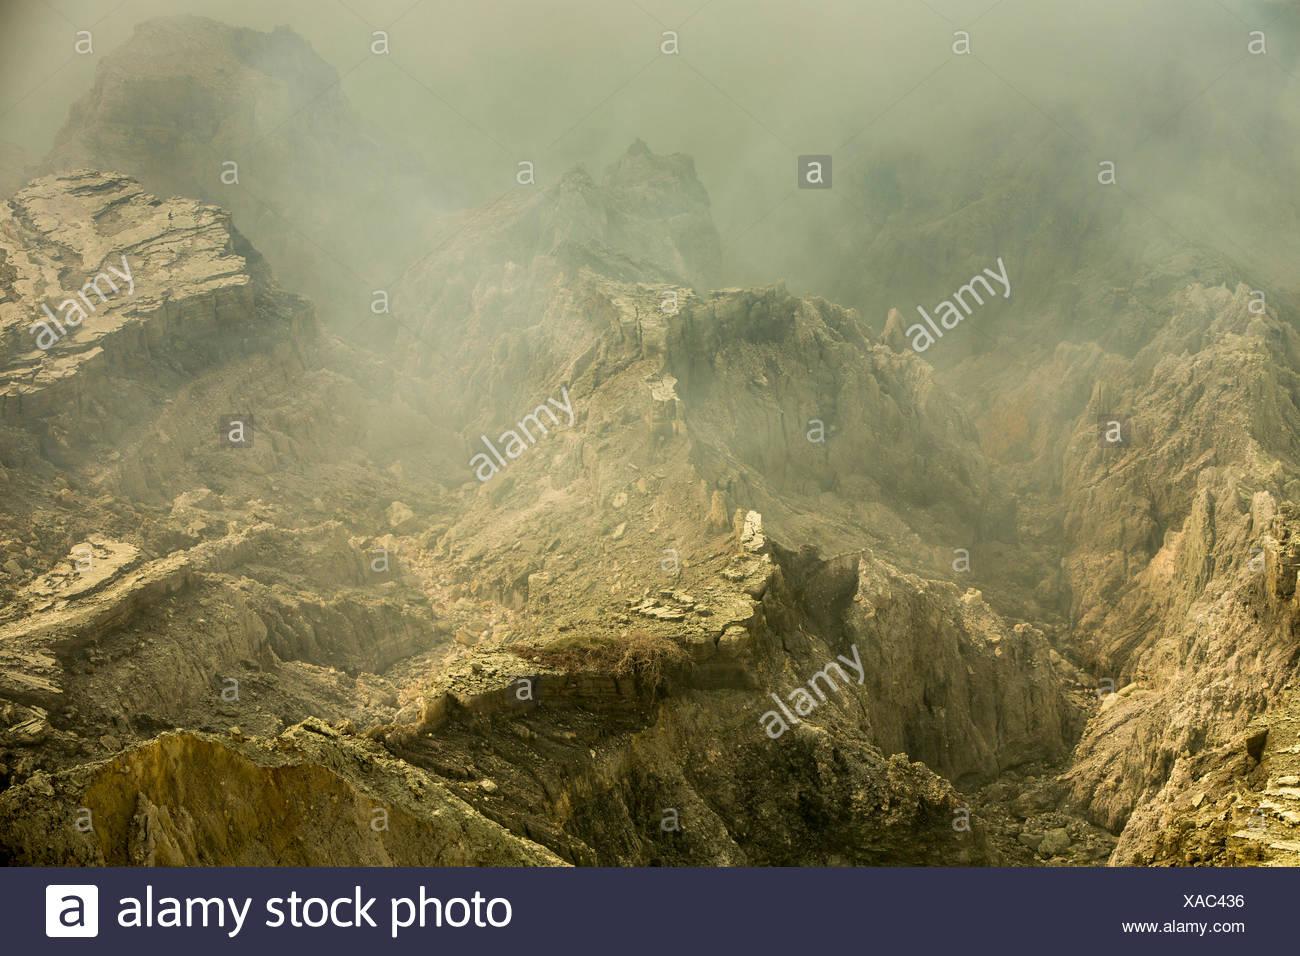 Eroded volcanic landforms of Kawah Ijen volcano, Banyuwangi, Java, Indonesia - Stock Image